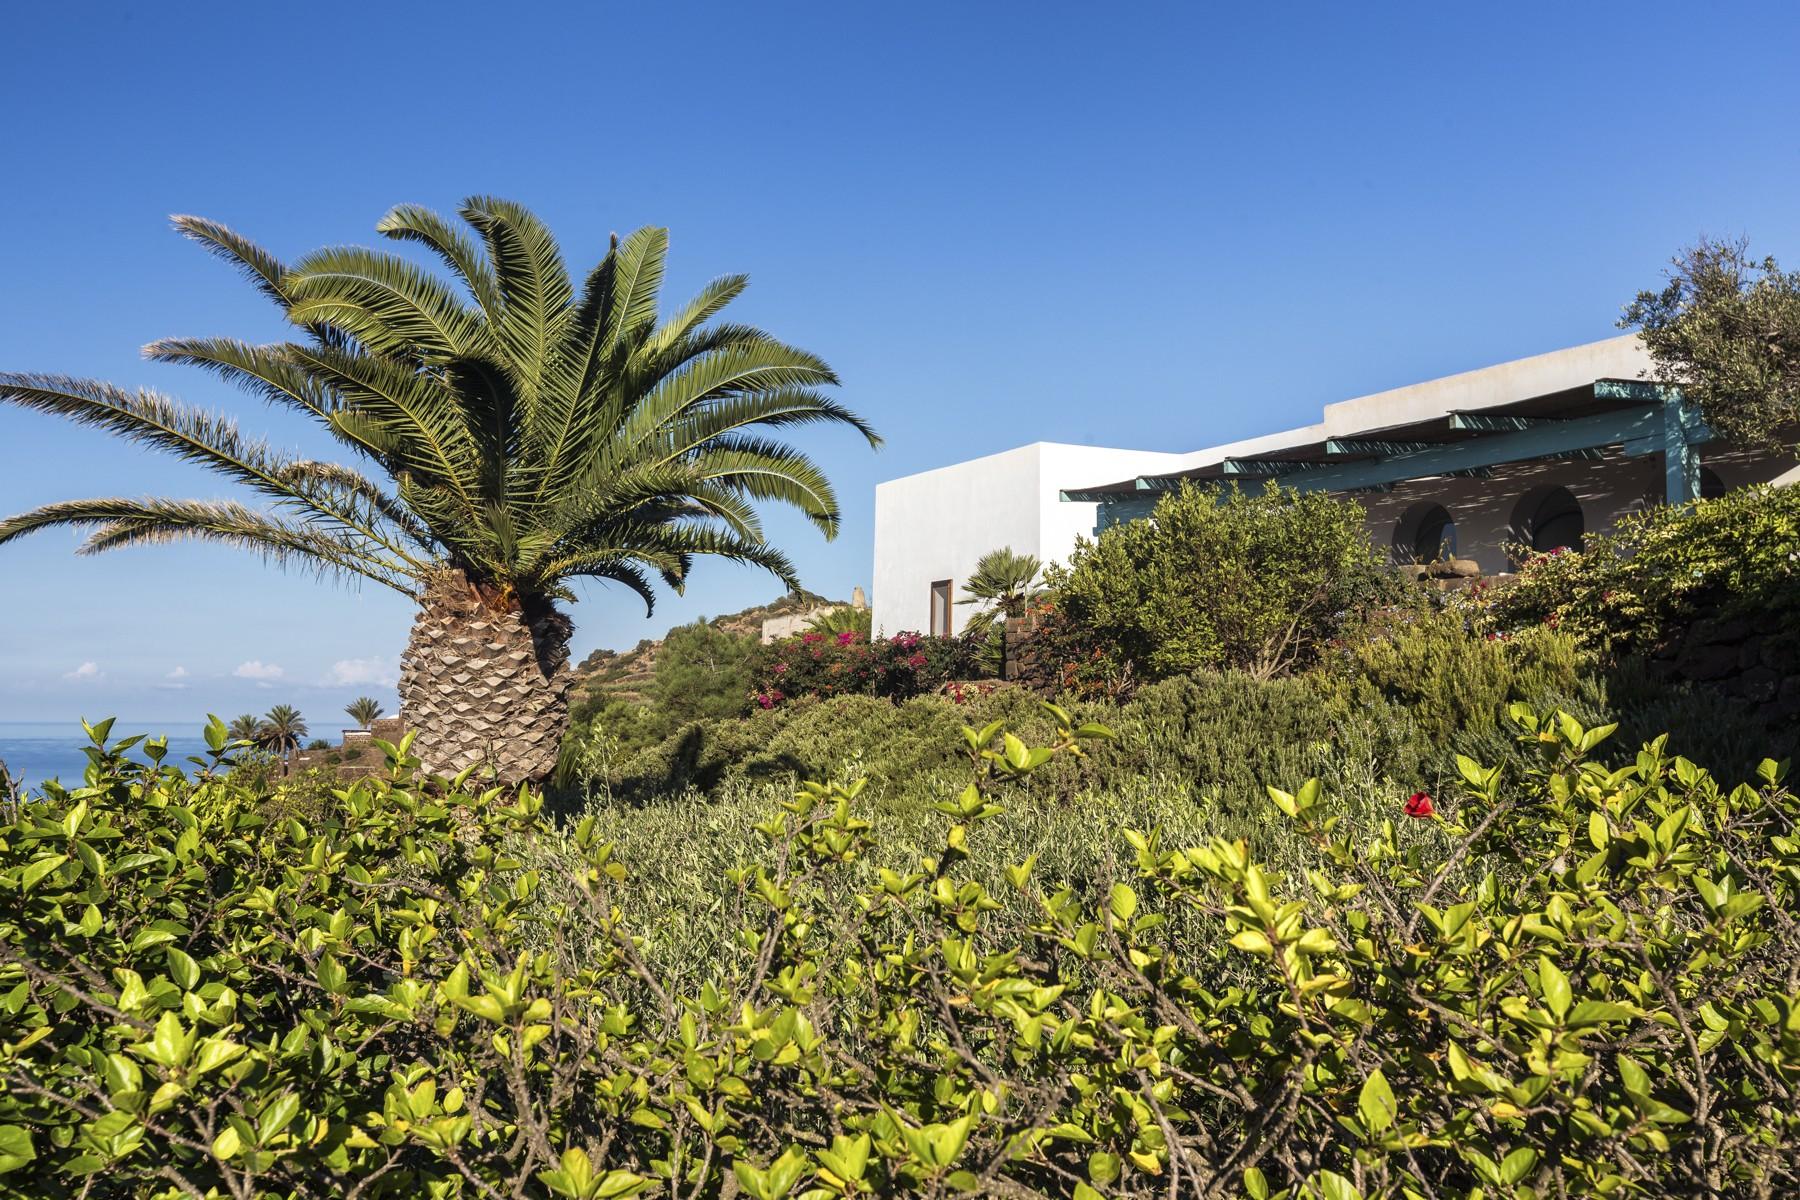 Villa in Vendita a Pantelleria: 5 locali, 530 mq - Foto 24